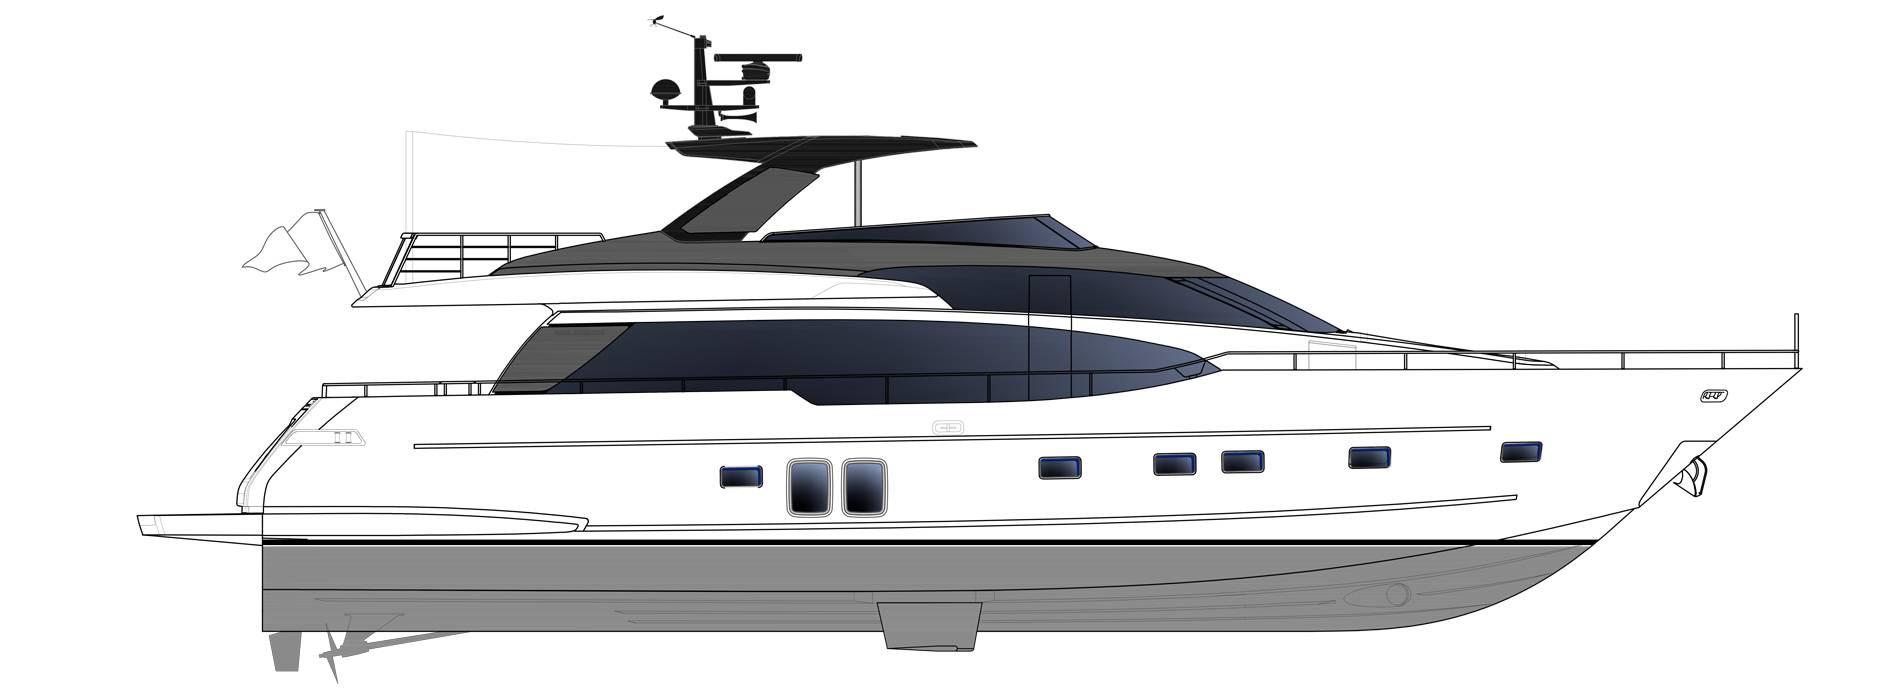 Sanlorenzo Yachts SL78-695 Profil